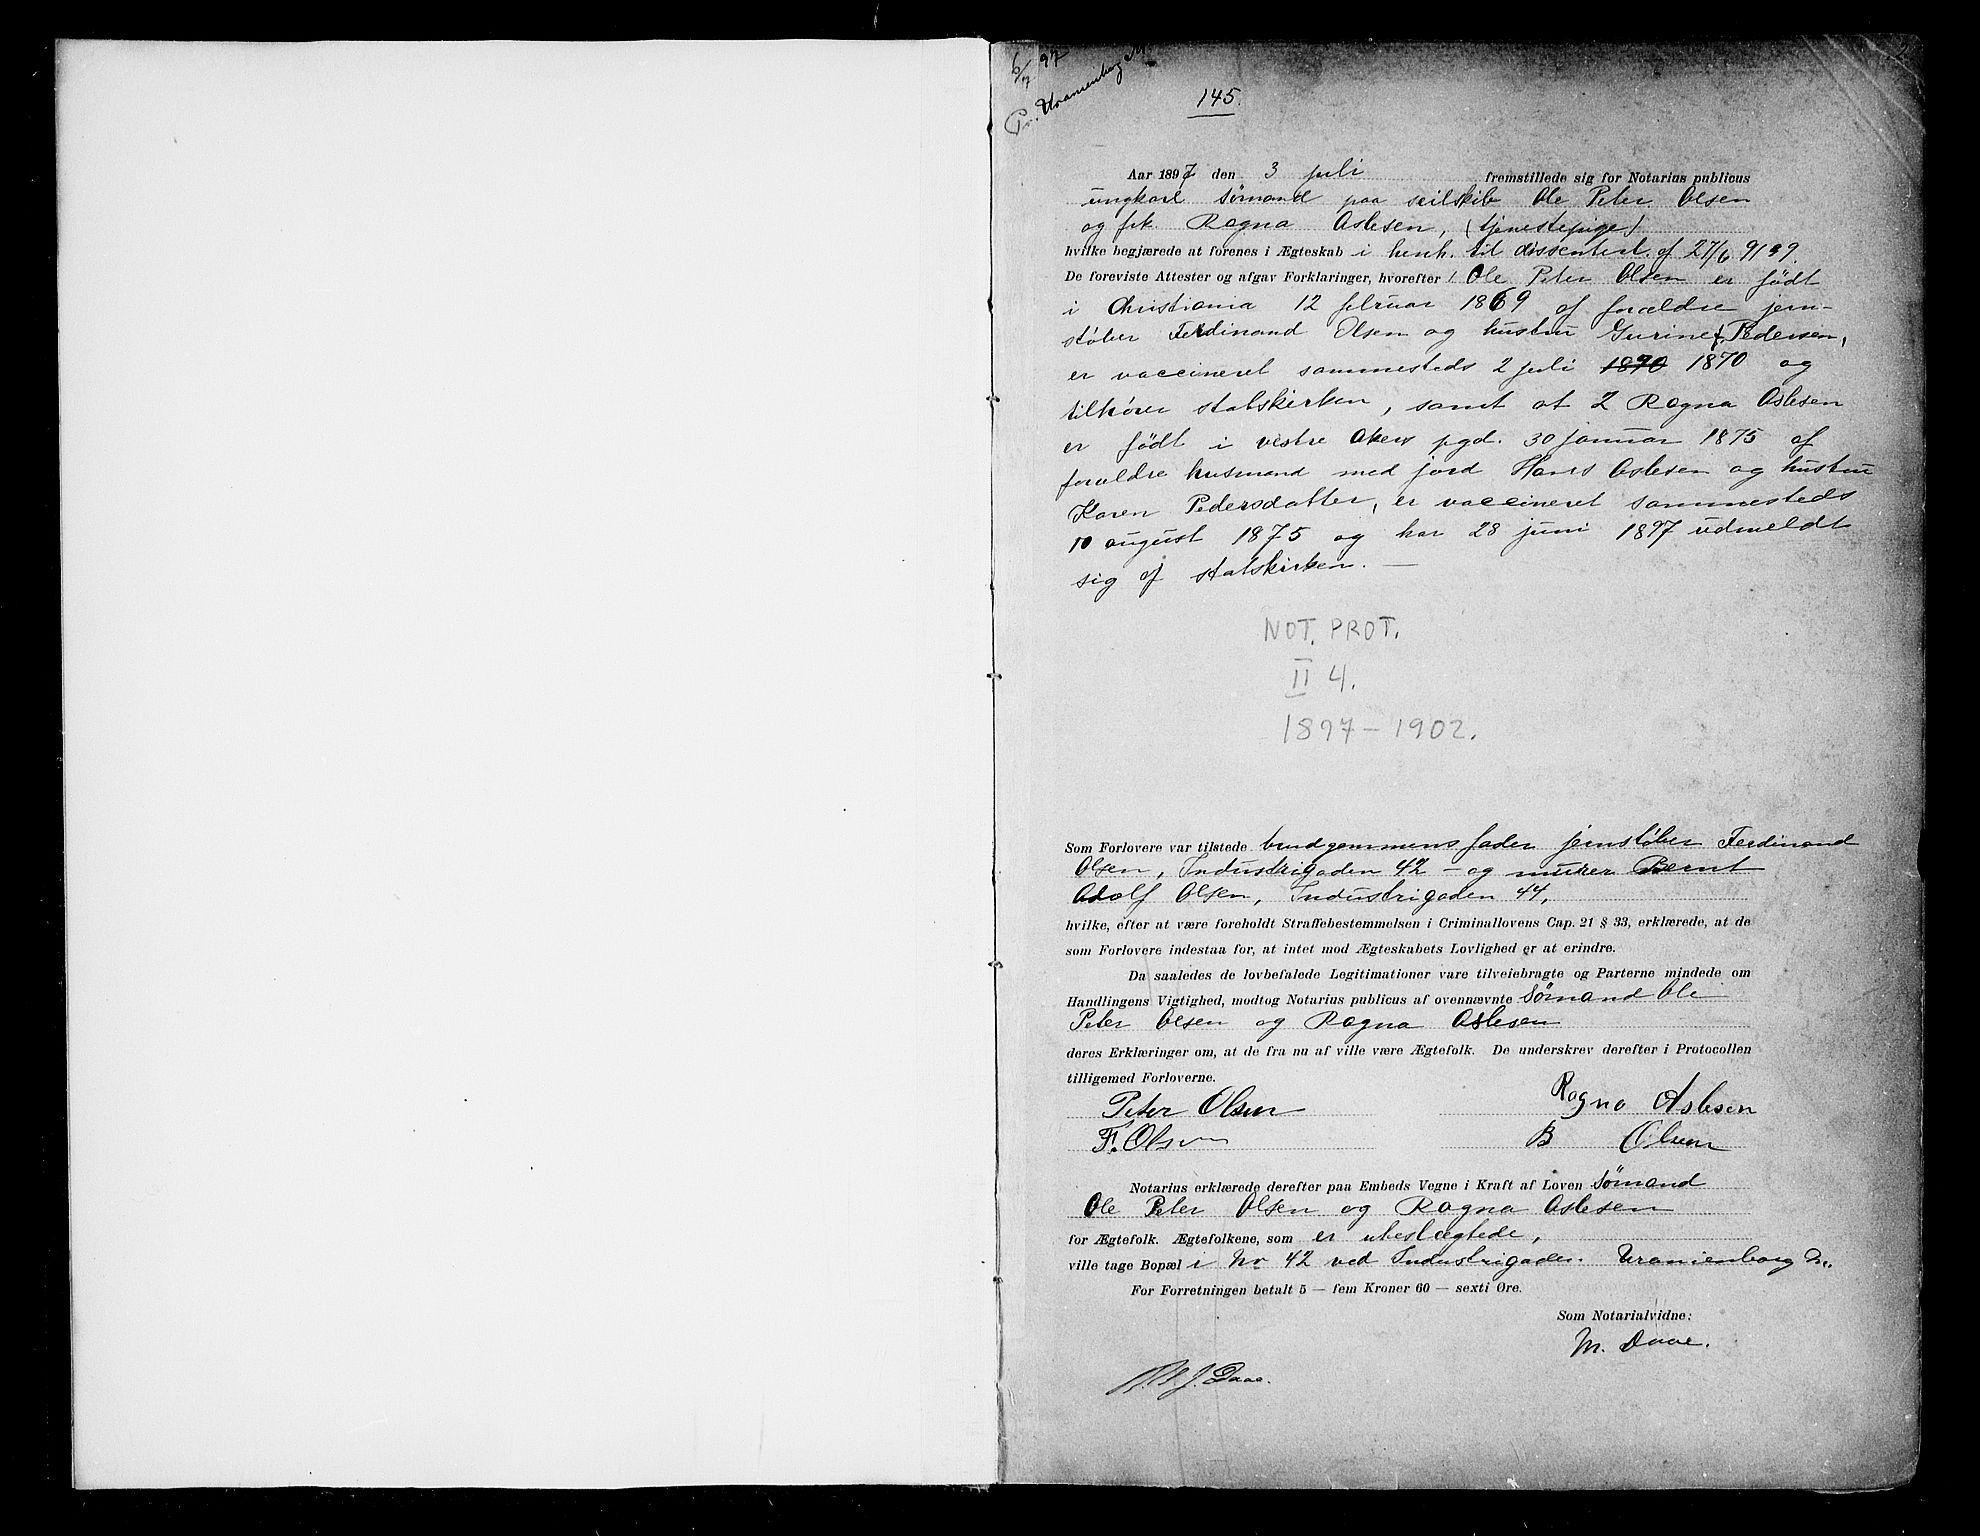 SAO, Oslo byfogd avd. I, L/Lb/Lbb/L0004: Notarialprotokoll, rekke II: Vigsler, 1897-1902, s. 1a